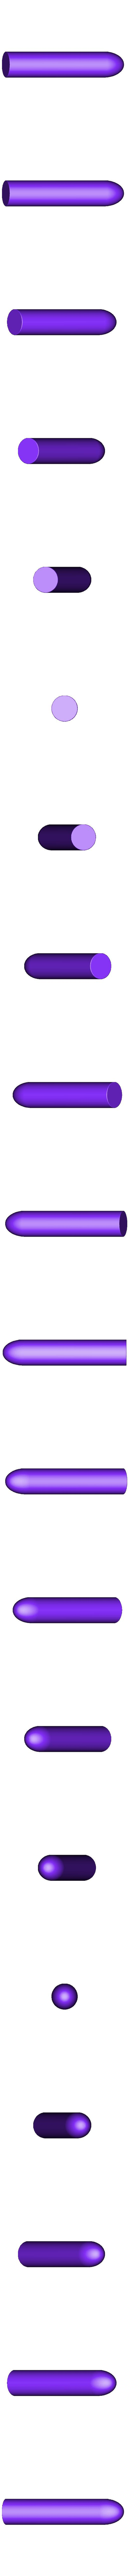 Star Wars VII The Force Awakens Kylo Ren Sword Cosplay Weapon Prop - Lightless_stl_Äåòàëü2_4.stl Download OBJ file Star Wars VII The Force Awakens Kylo Ren Sword Cosplay Prop • 3D printer object, Blackeveryday